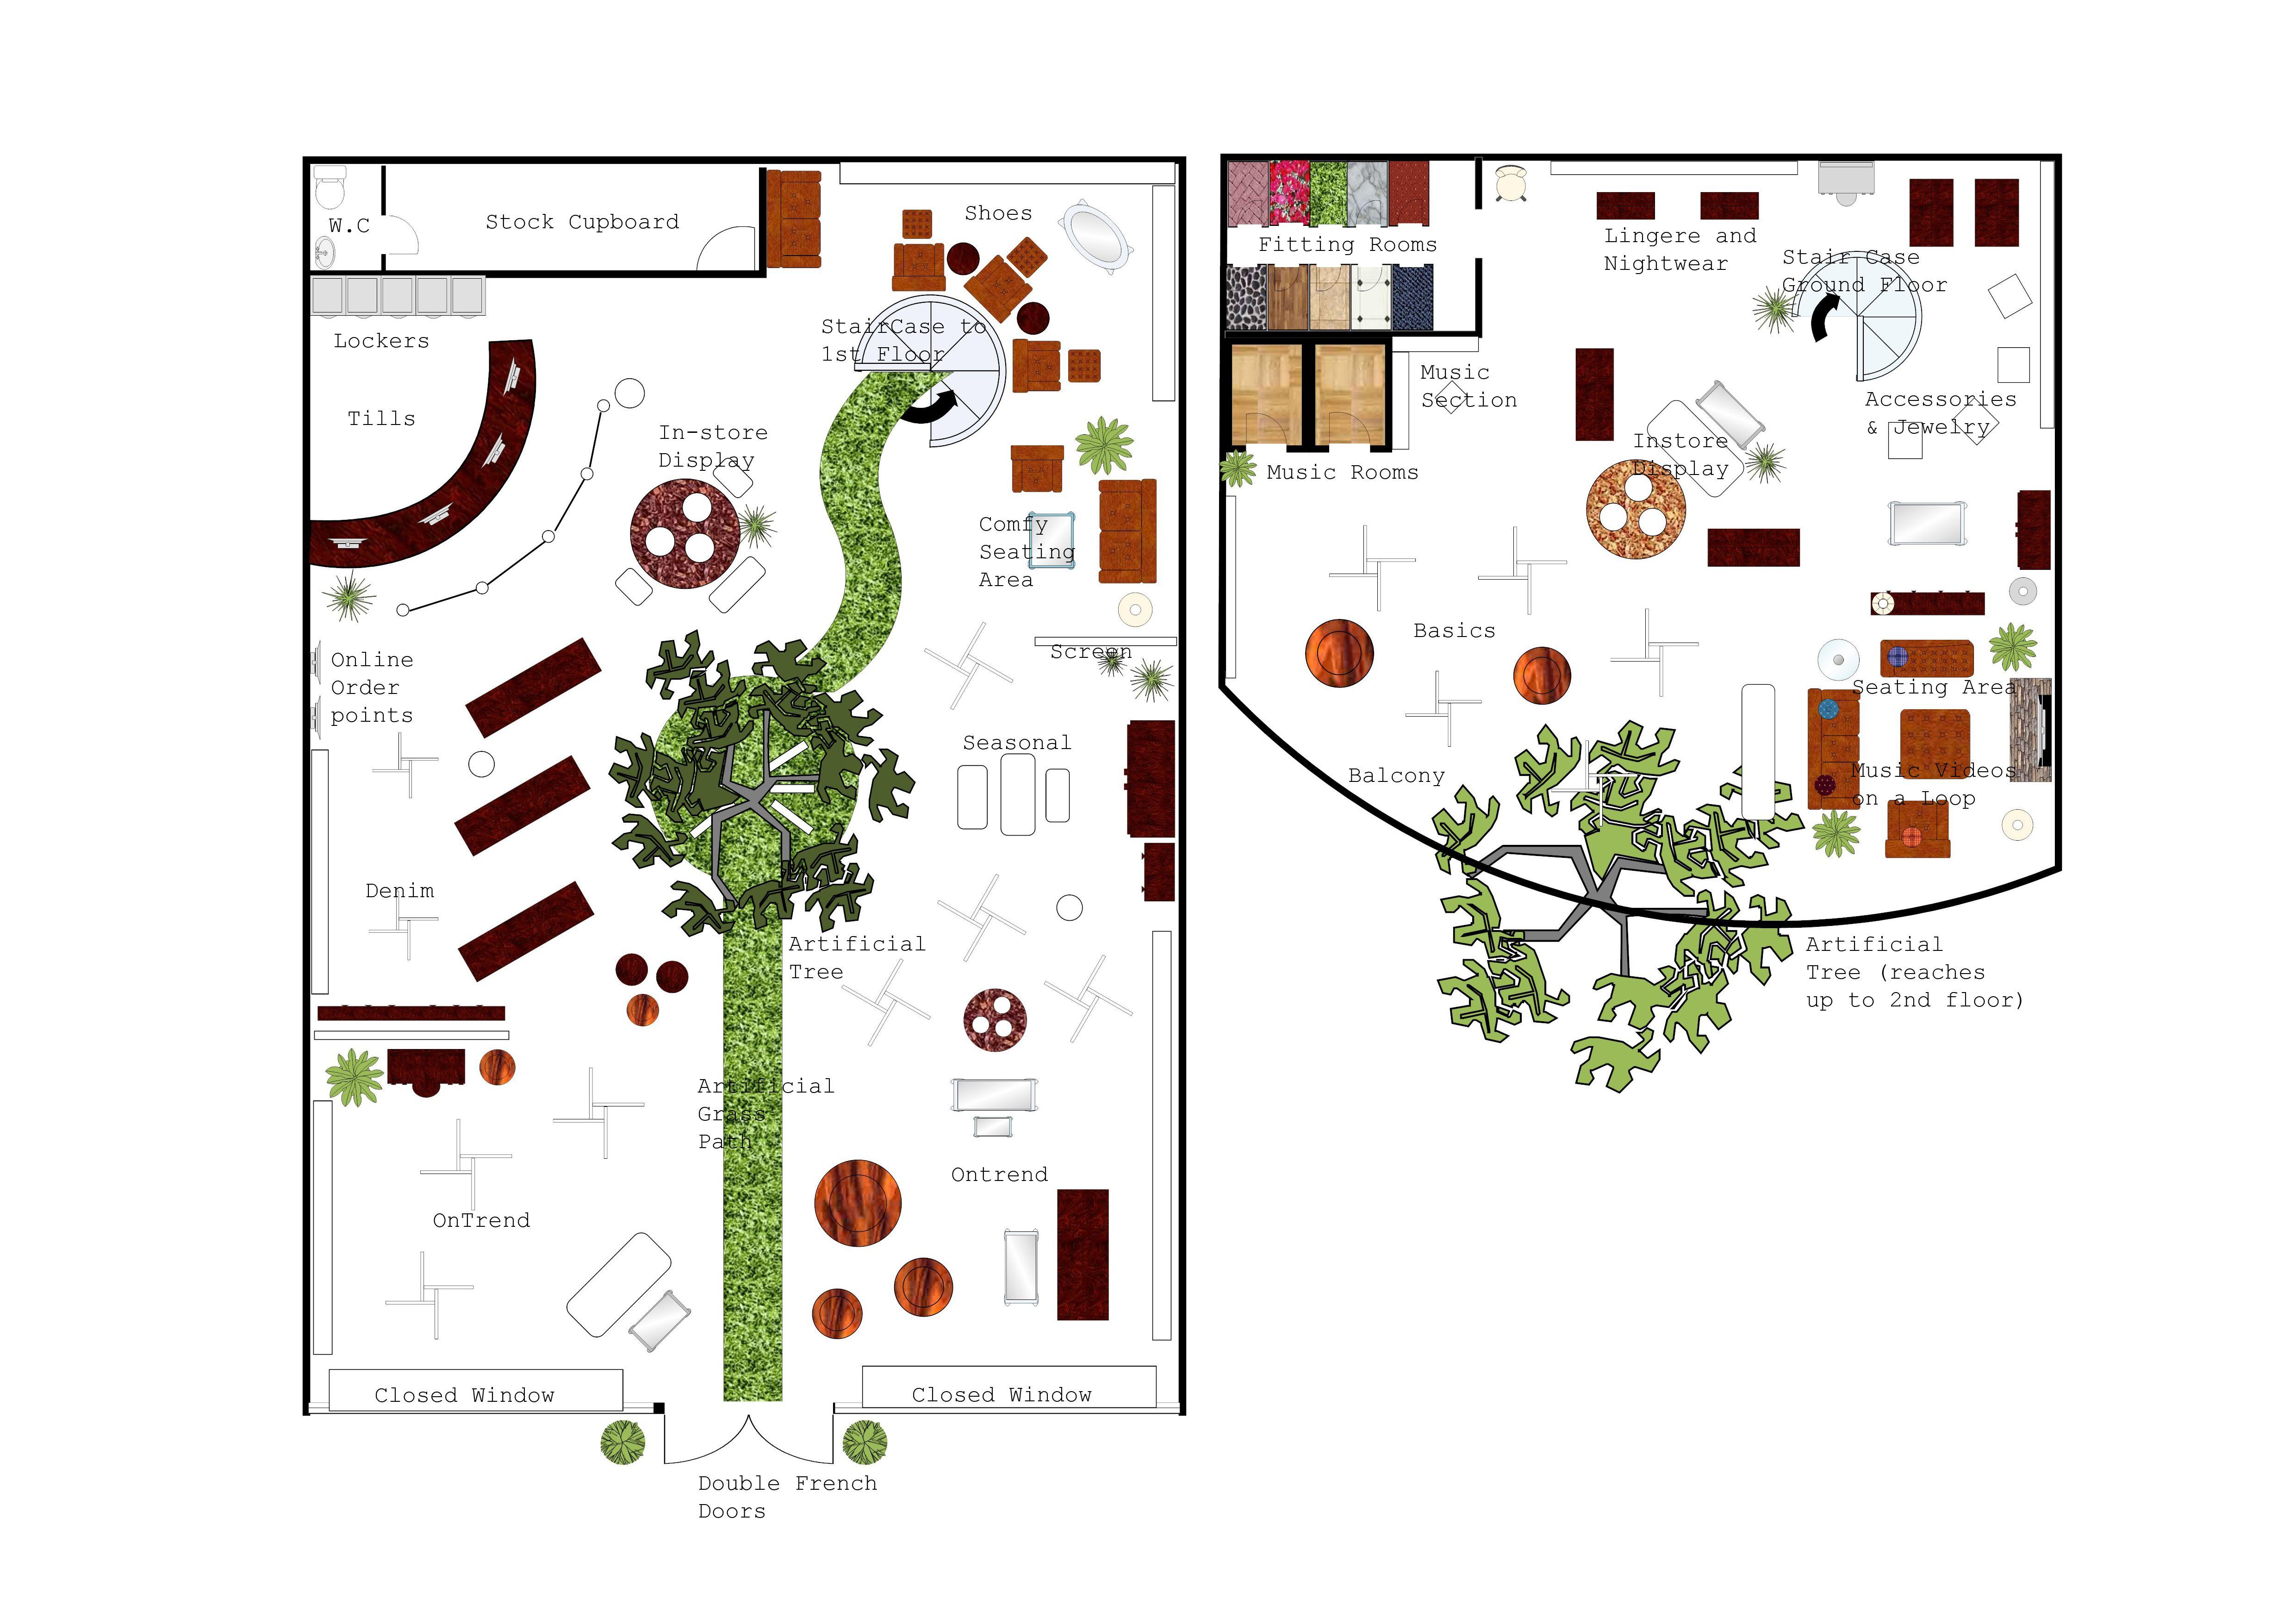 store floor plan design. Store Layout · Shoplayout.jpg 4.961×3.508 Pixels Floor Plan Design